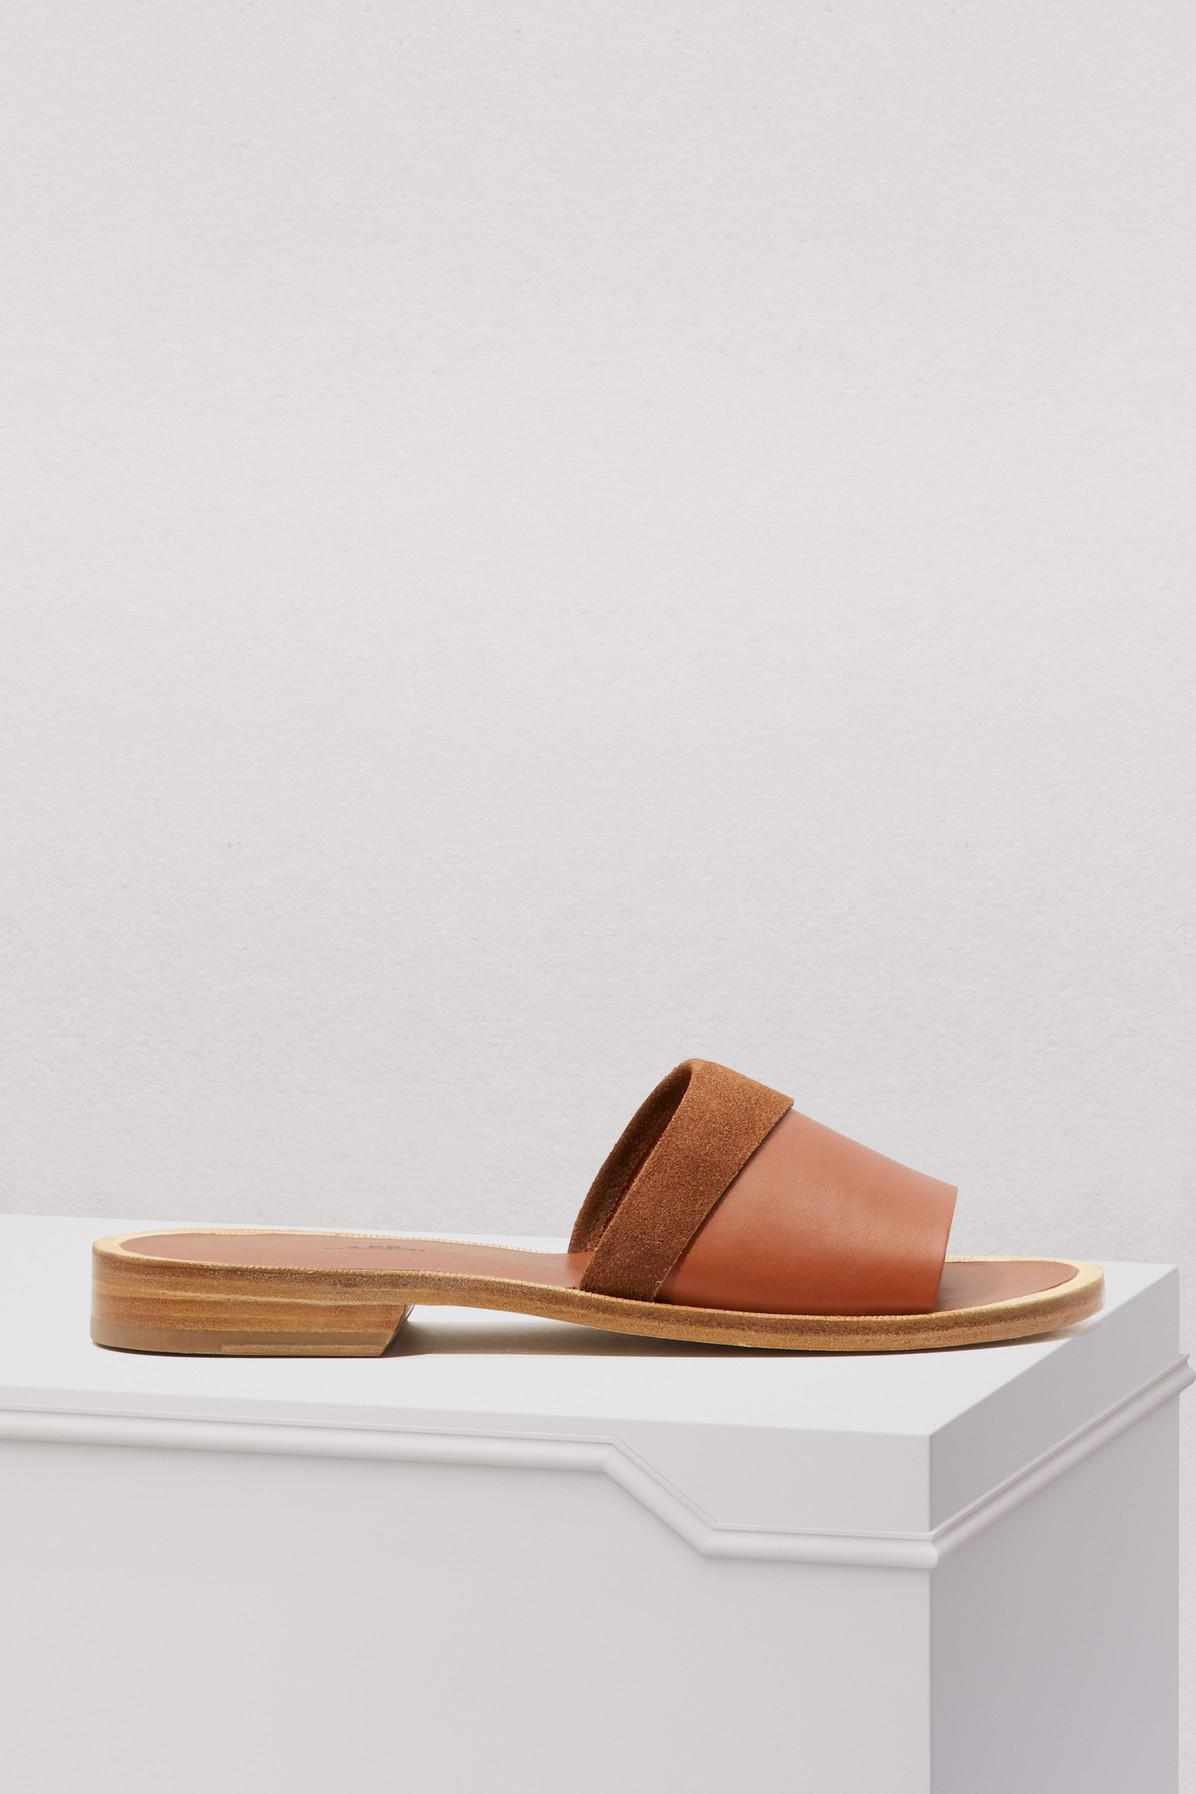 A.P.C Kenza sandals